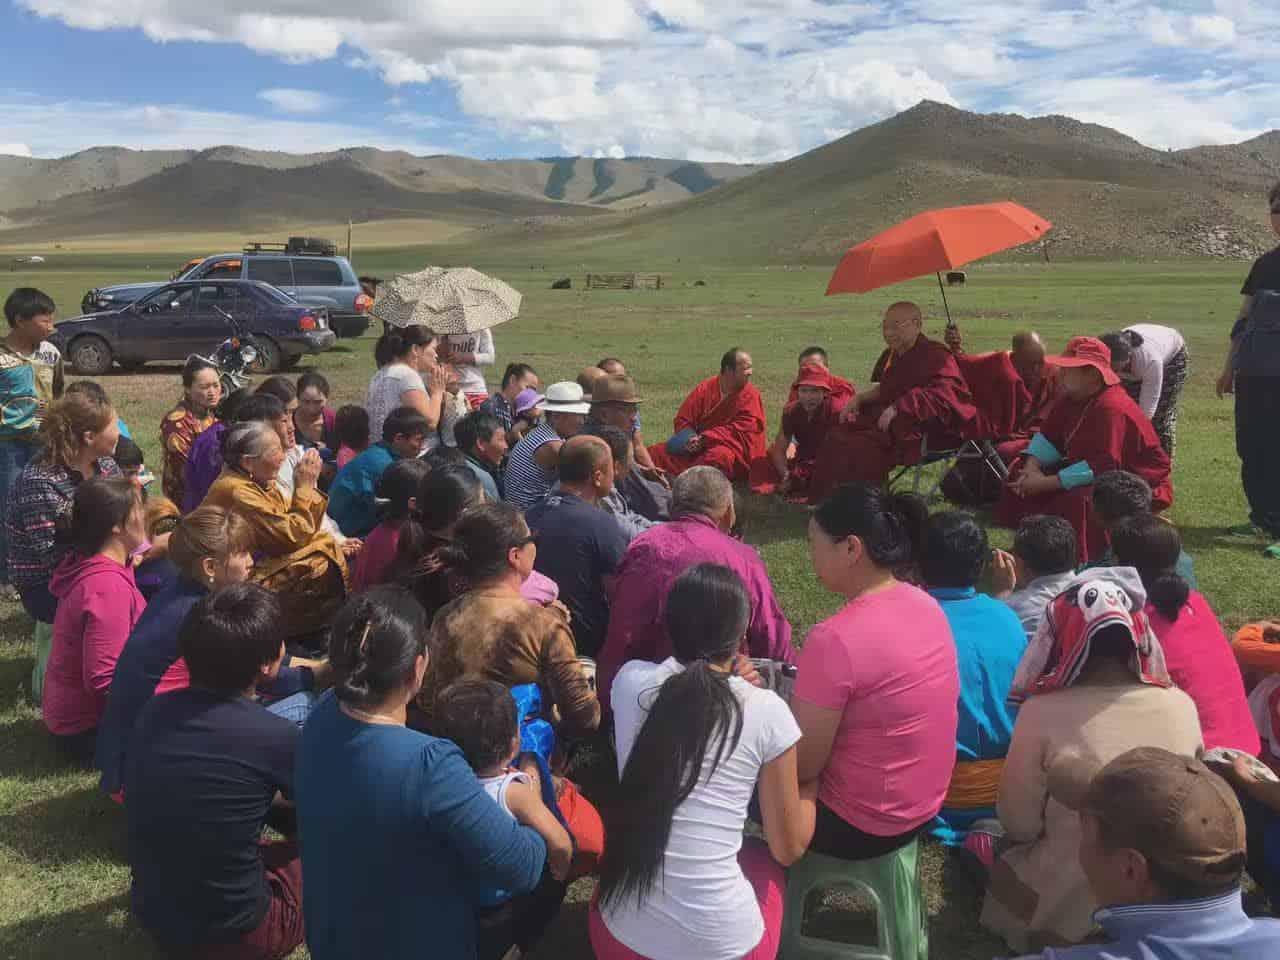 gosok-rinpoche-mongolia-2016-2e1256a14d6cf6c84c50f7465e3ac48